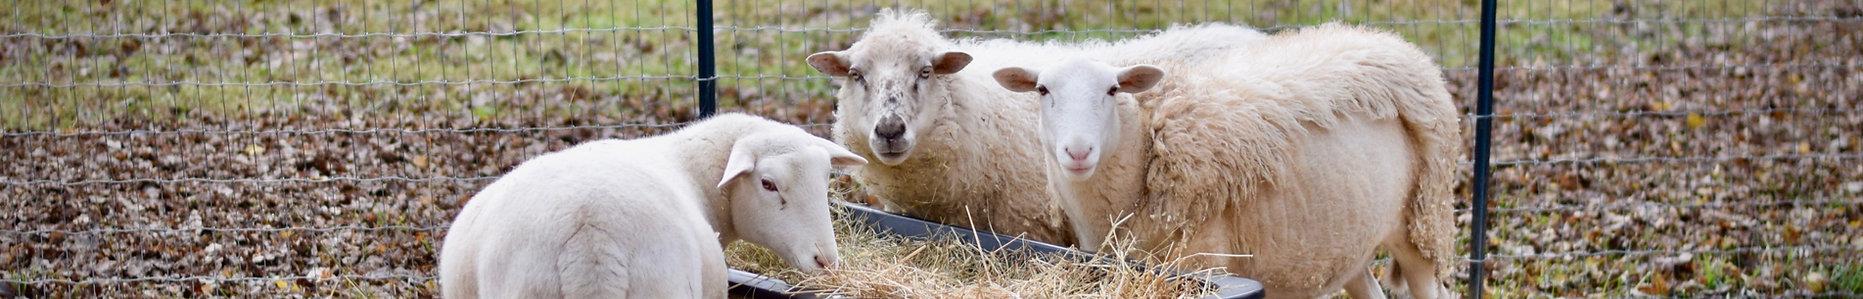 Foreverland Farm sheep